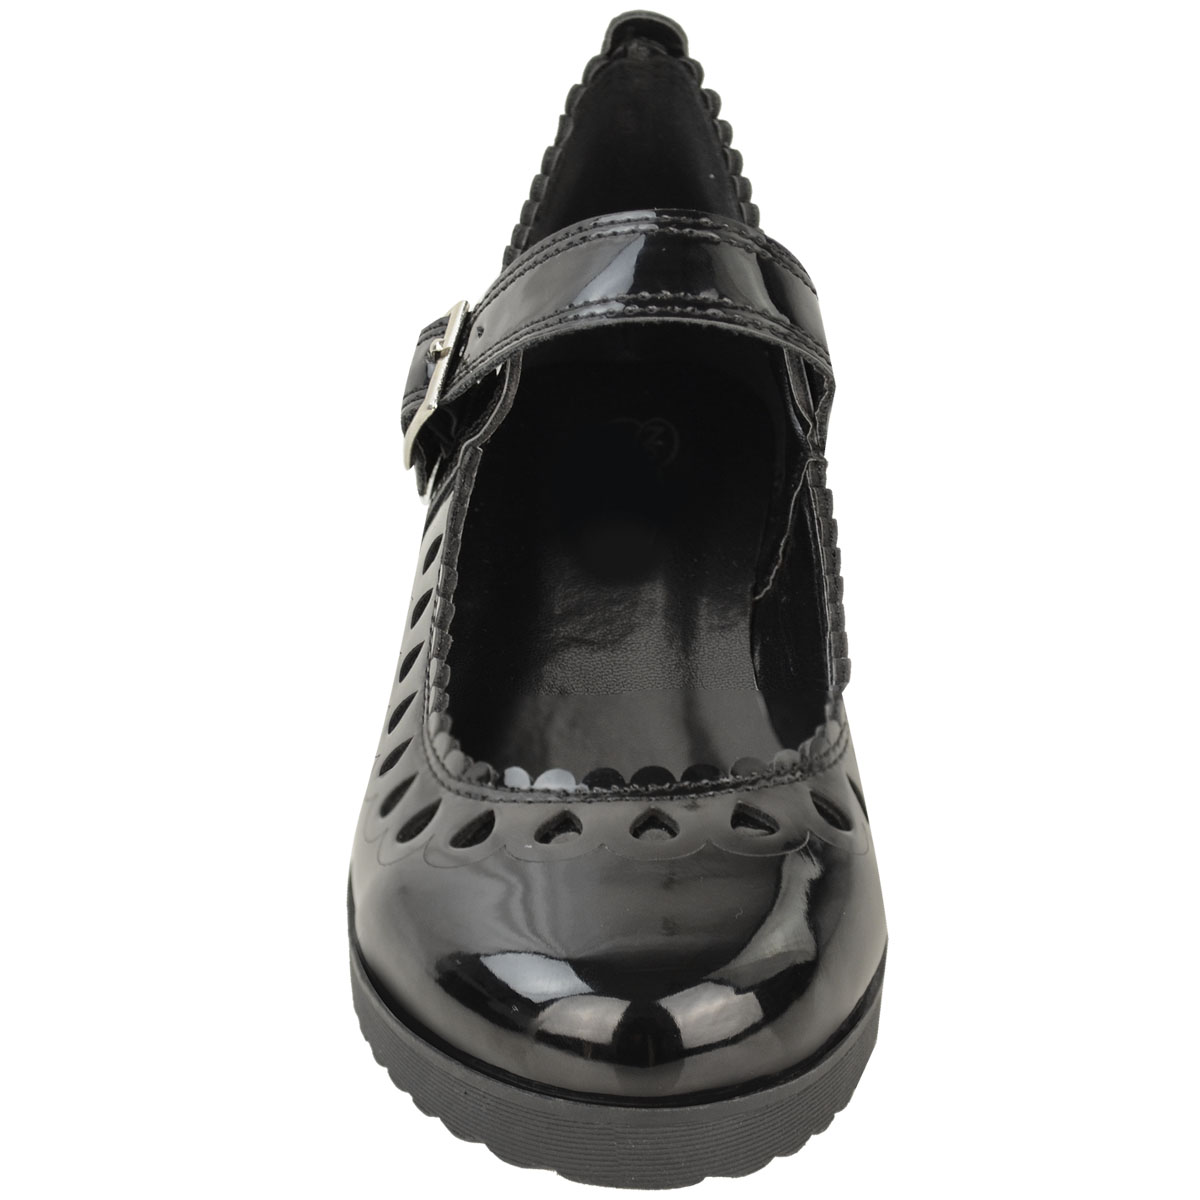 New-Womens-Ladies-Girls-Flats-Shoes-Pumps-School-Work-Office-Geek-Low-Heels-Size thumbnail 5